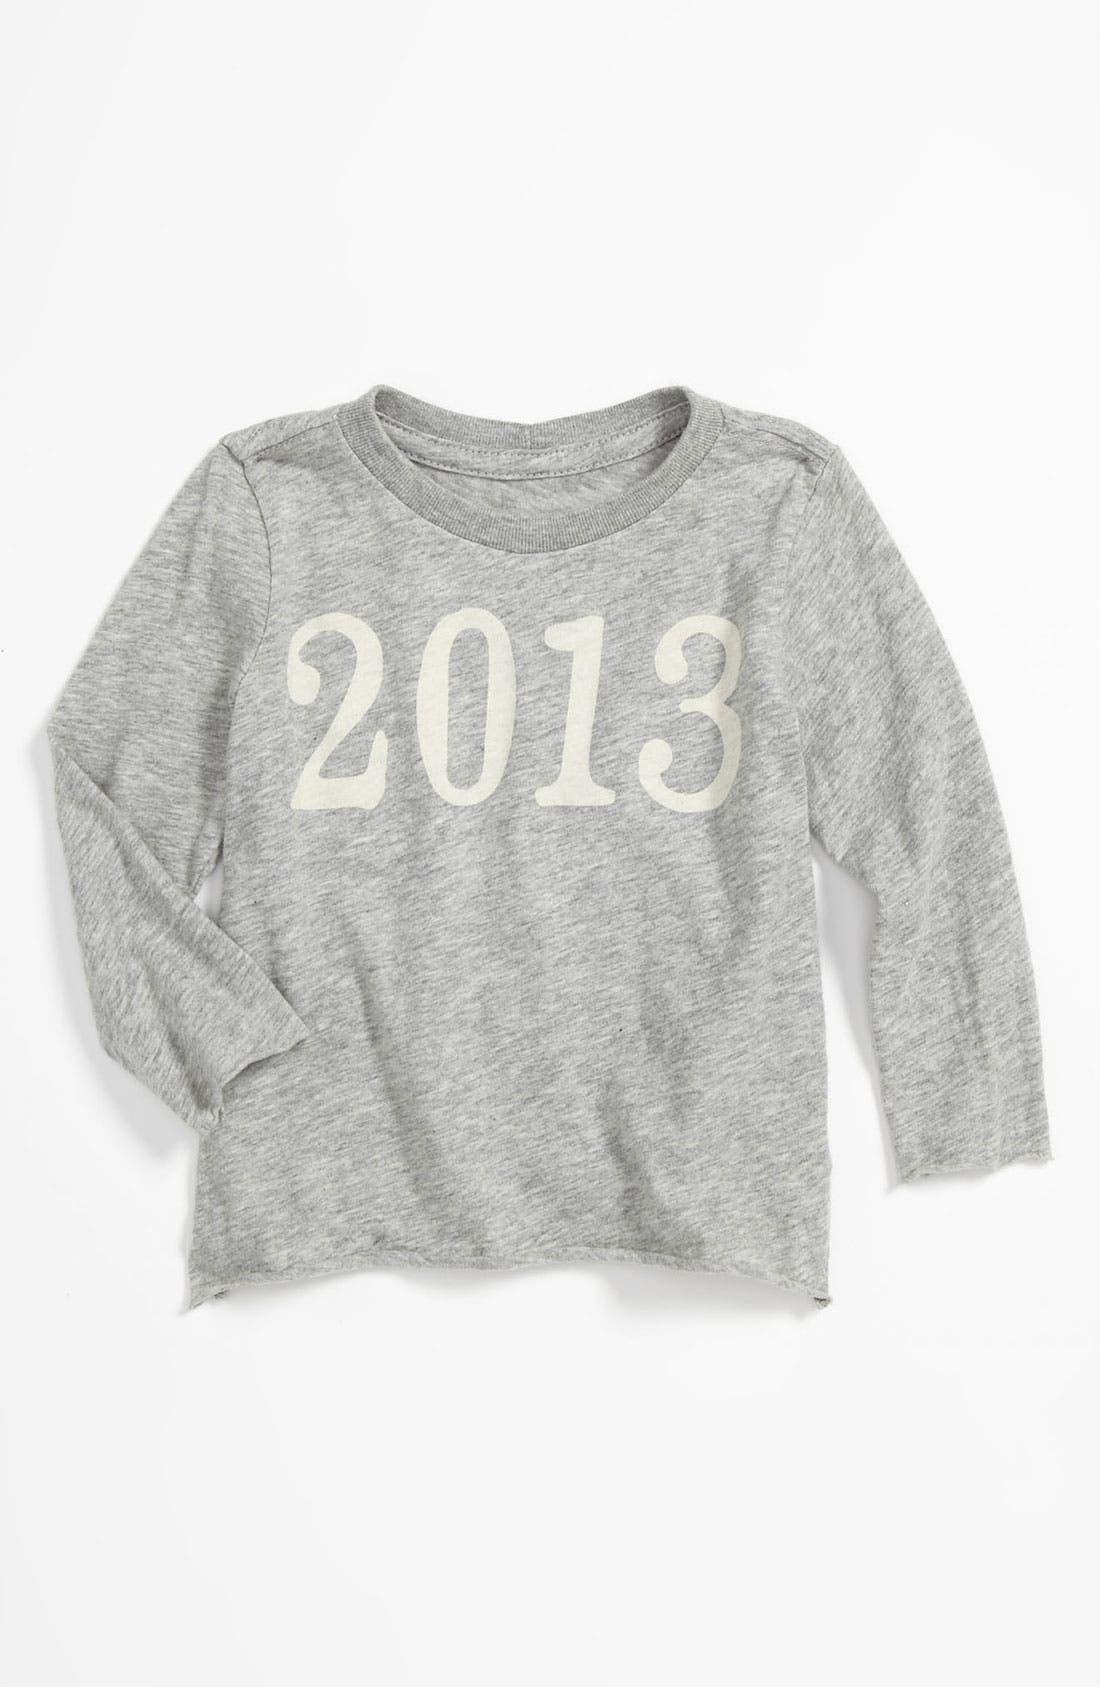 Alternate Image 1 Selected - Peek 'Little Peanut - 2013' T-Shirt (Baby)